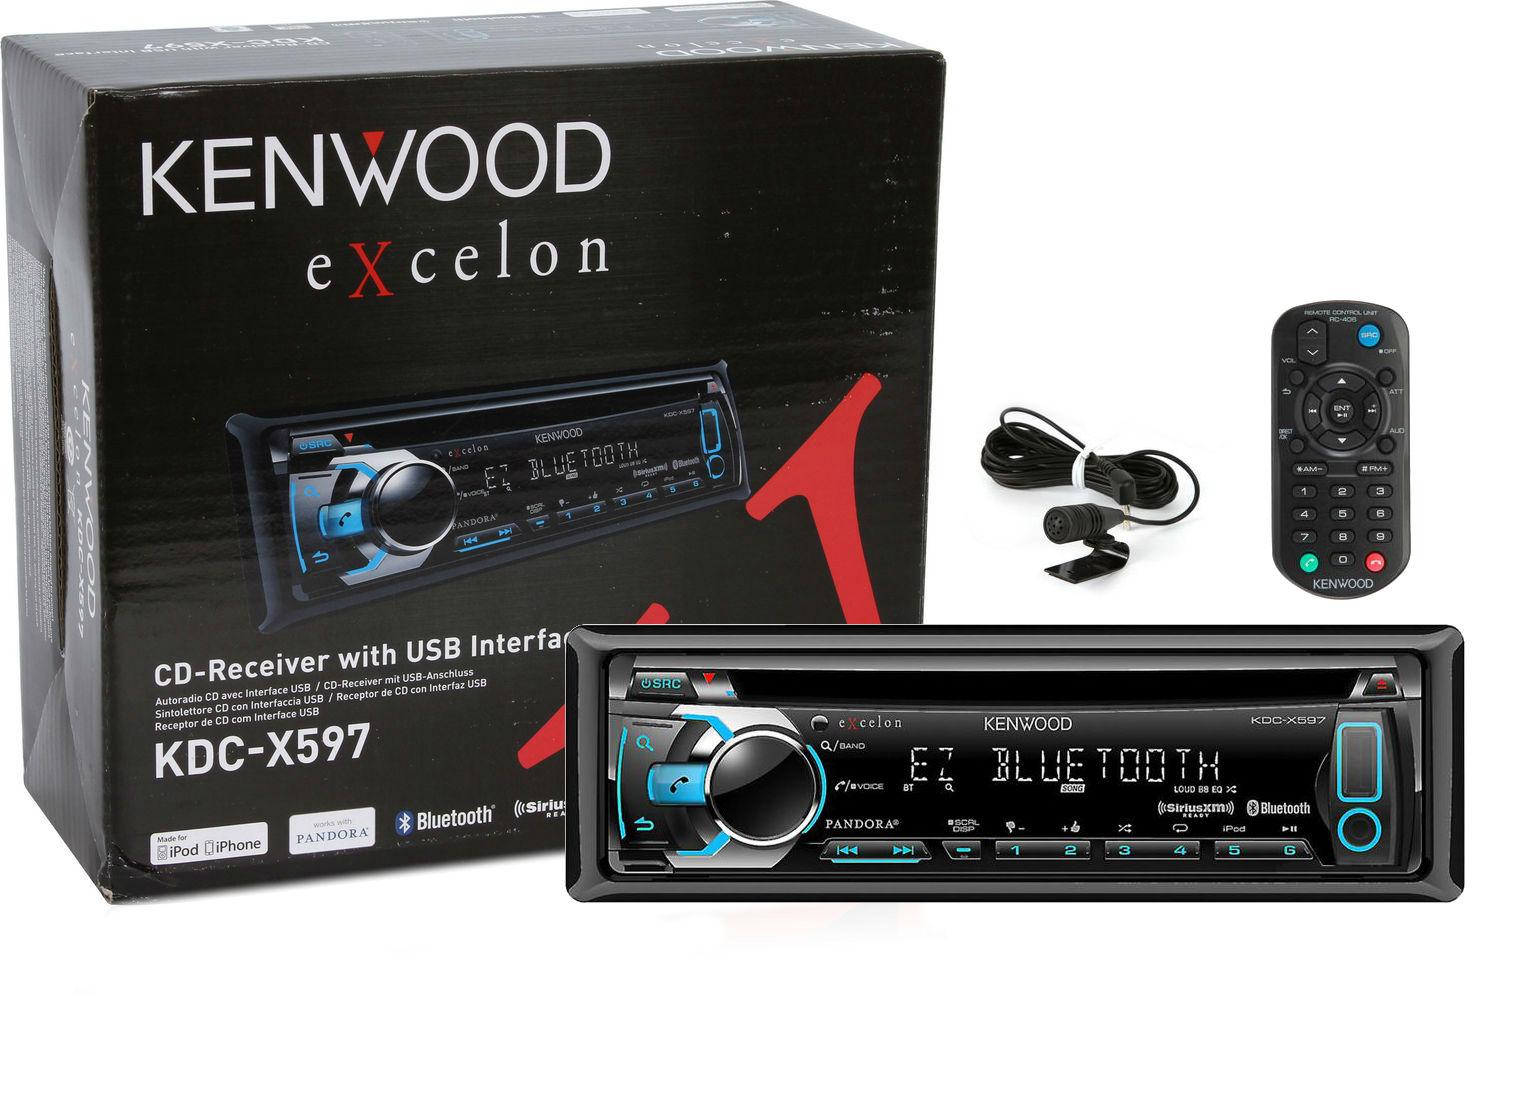 kenwood model kdc wiring diagram s drive car cd receiver x597 bluetooth pandora usb aux